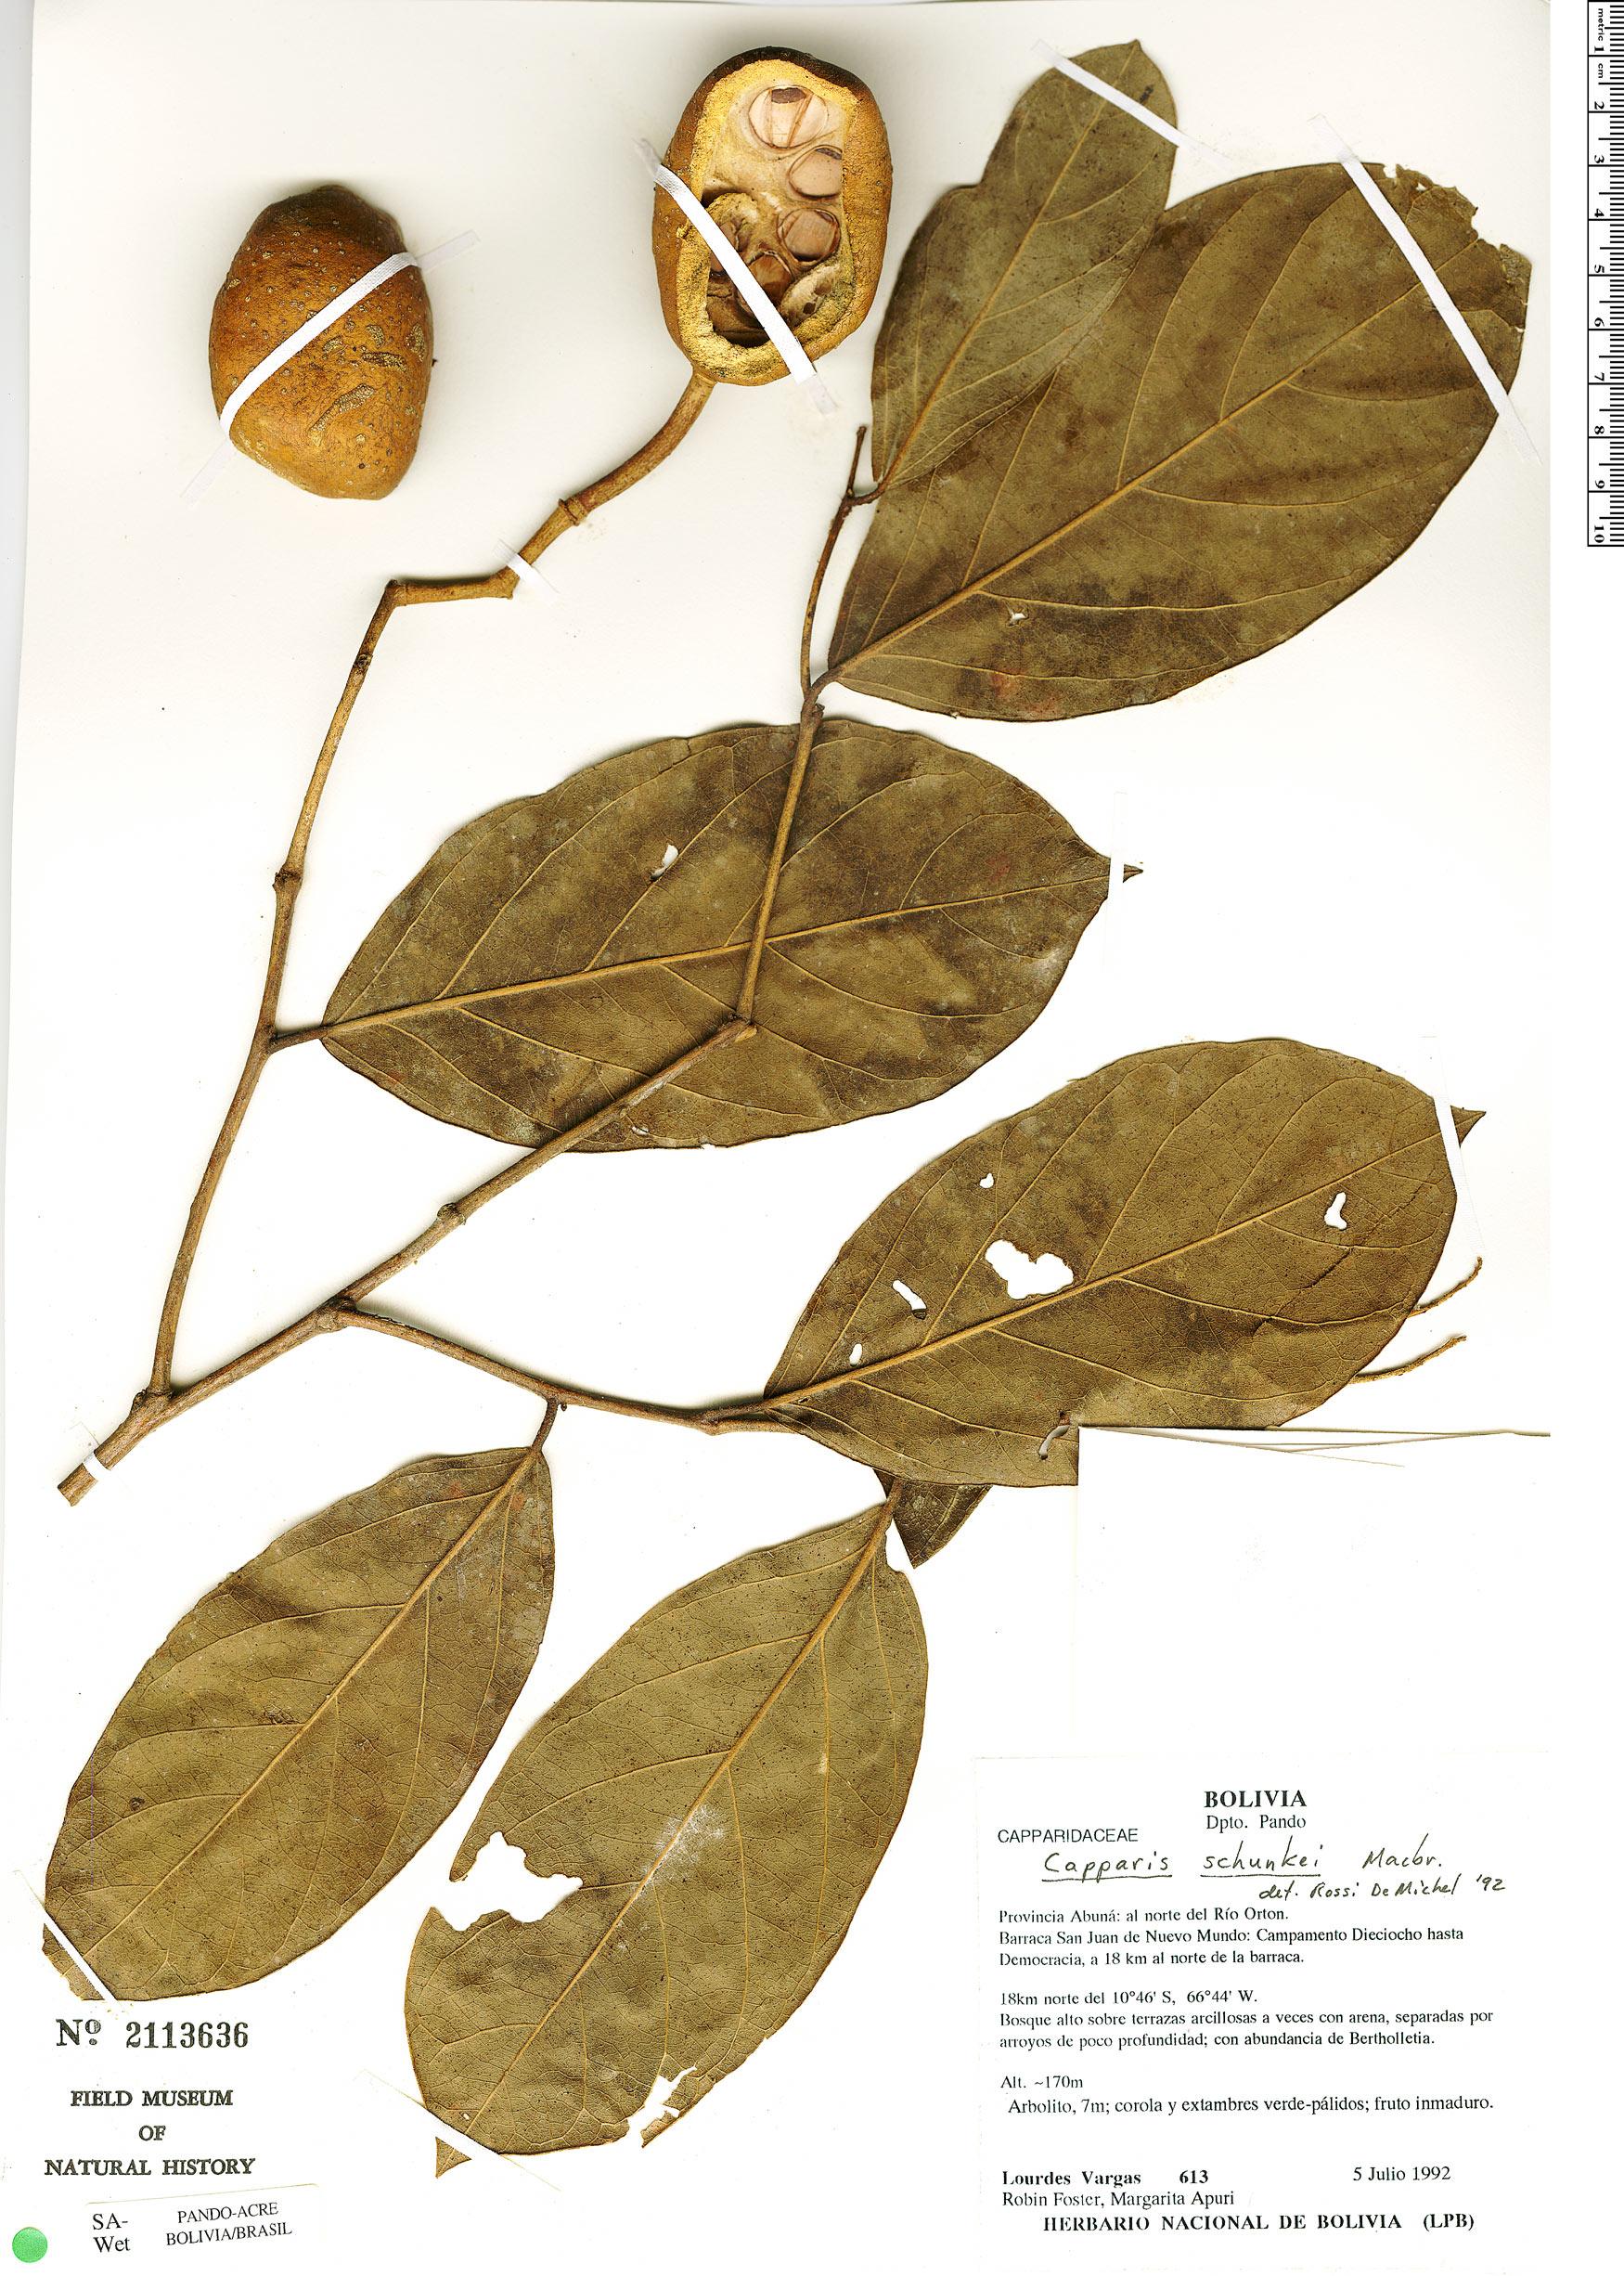 Specimen: Preslianthus pittieri